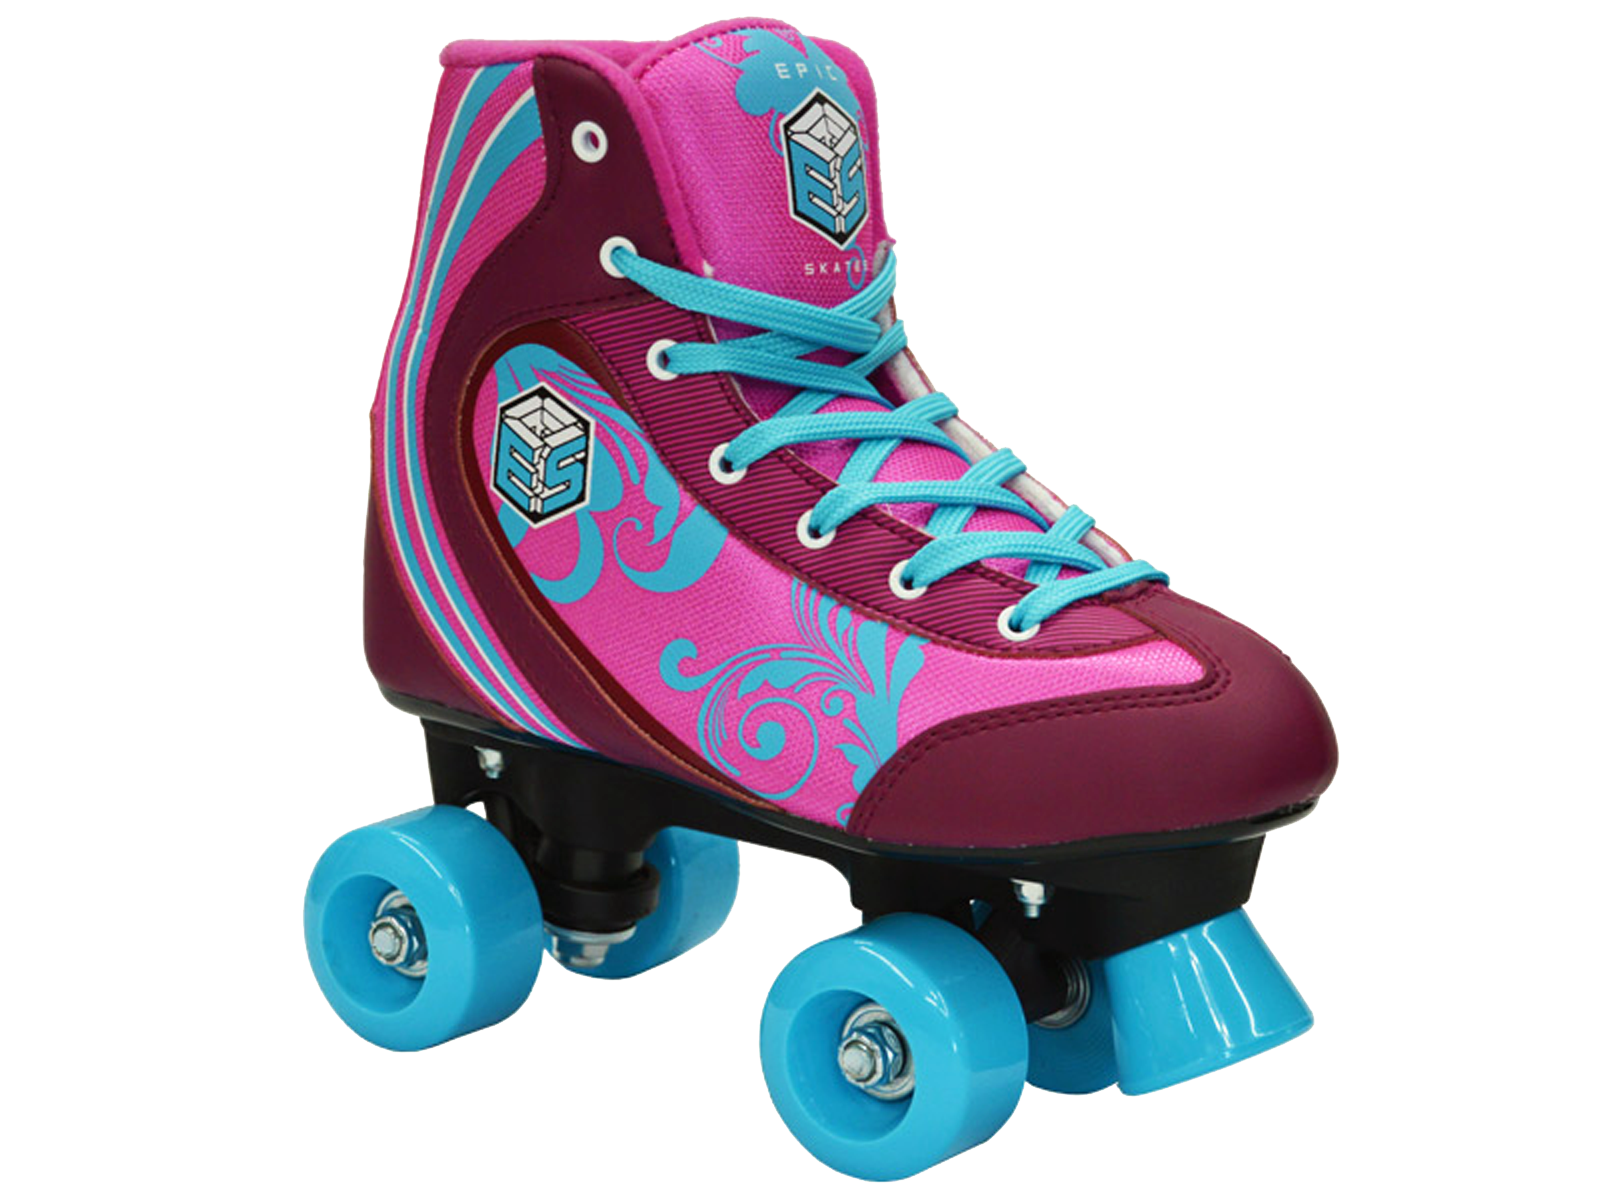 Roller skates rainbow - Candy Series Quad Skates